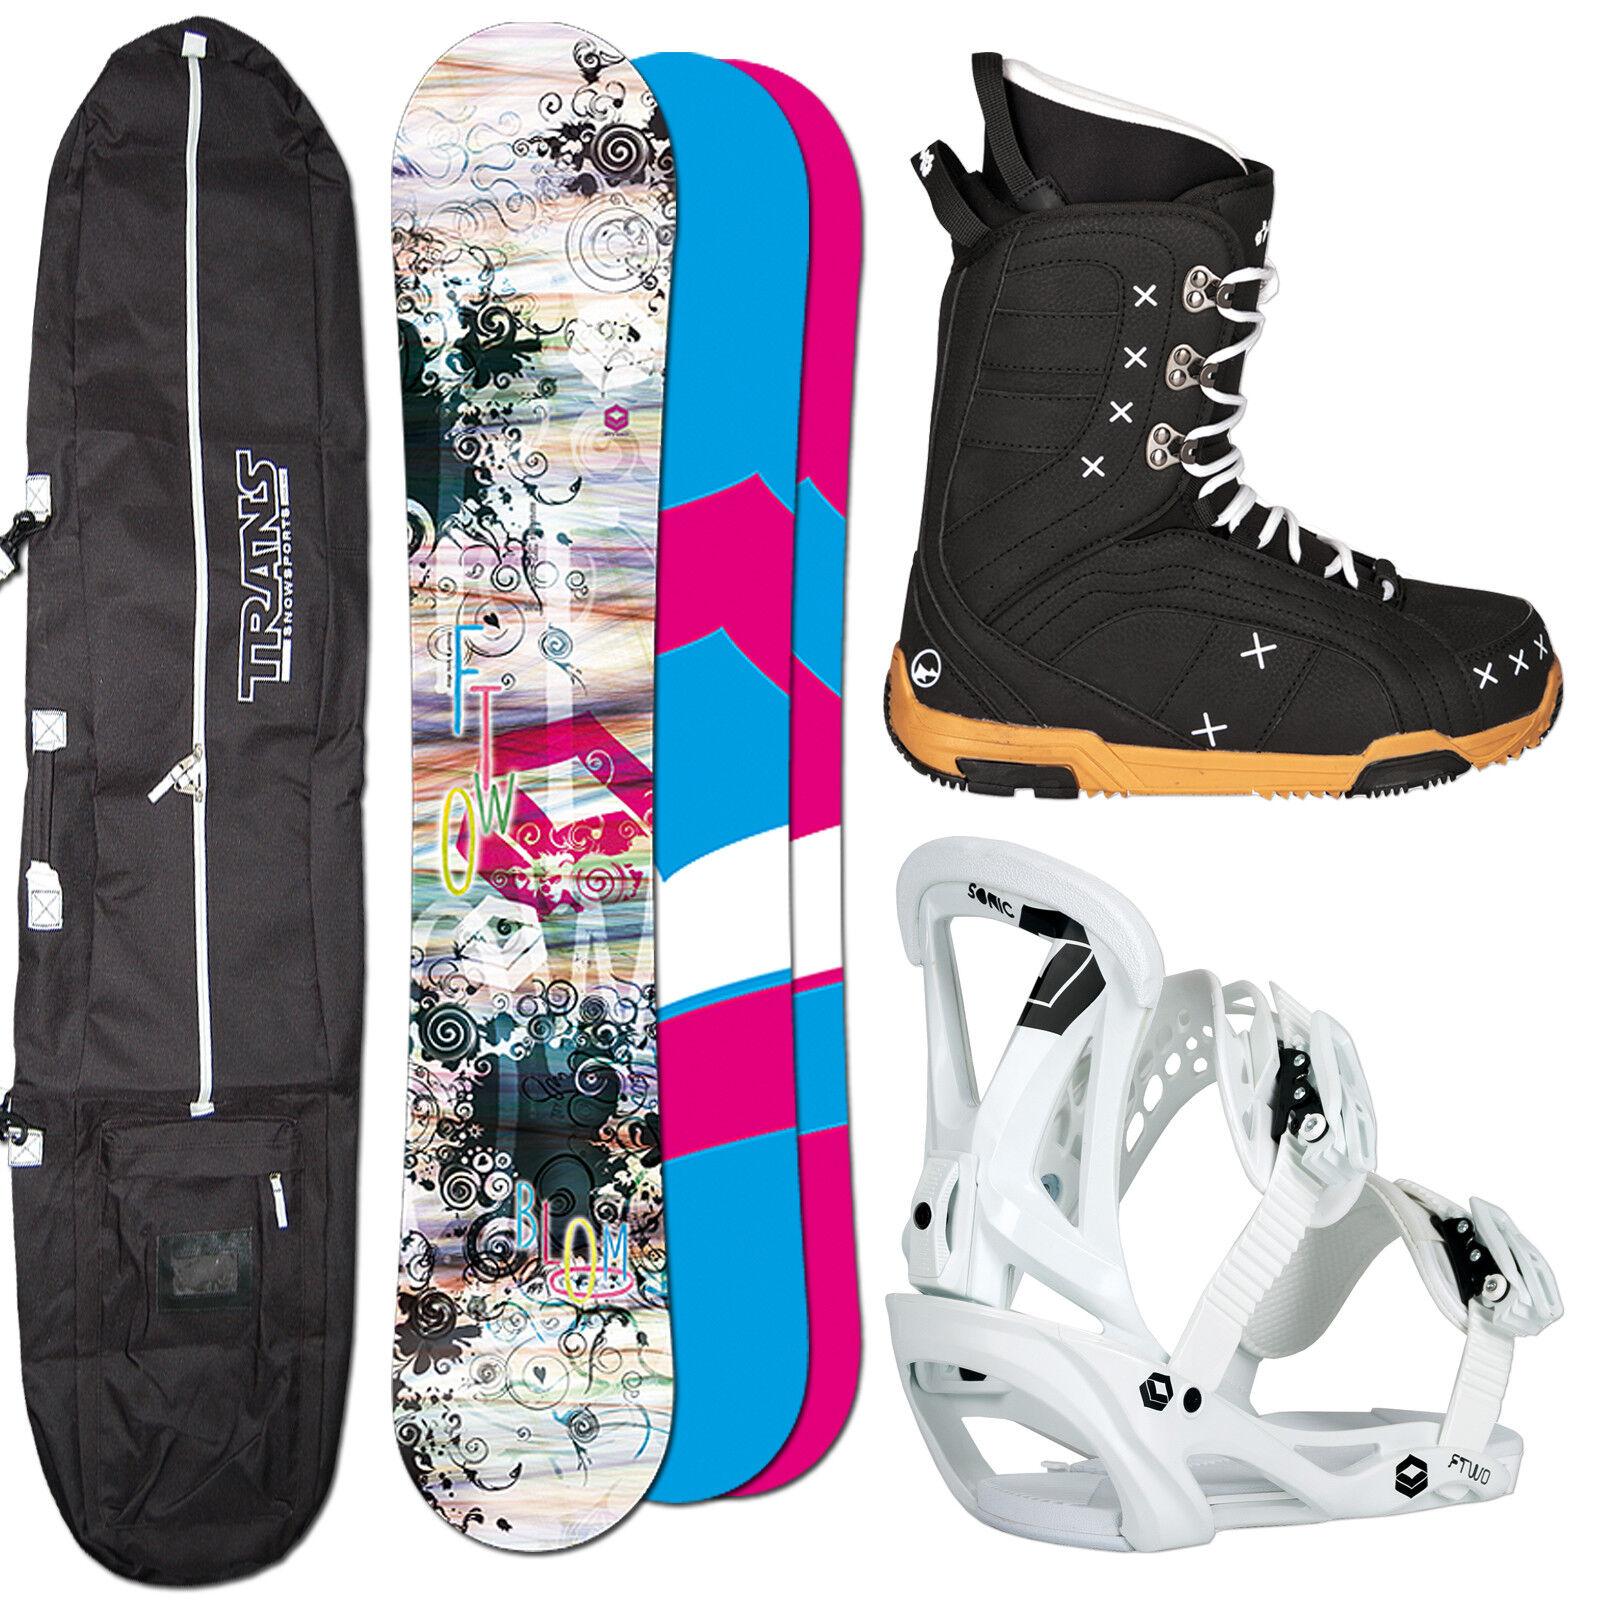 Snowboard Mujer Set Ftwo Bloom 151 cm + Sonic Fijación TALLA M + botas + Bolsa